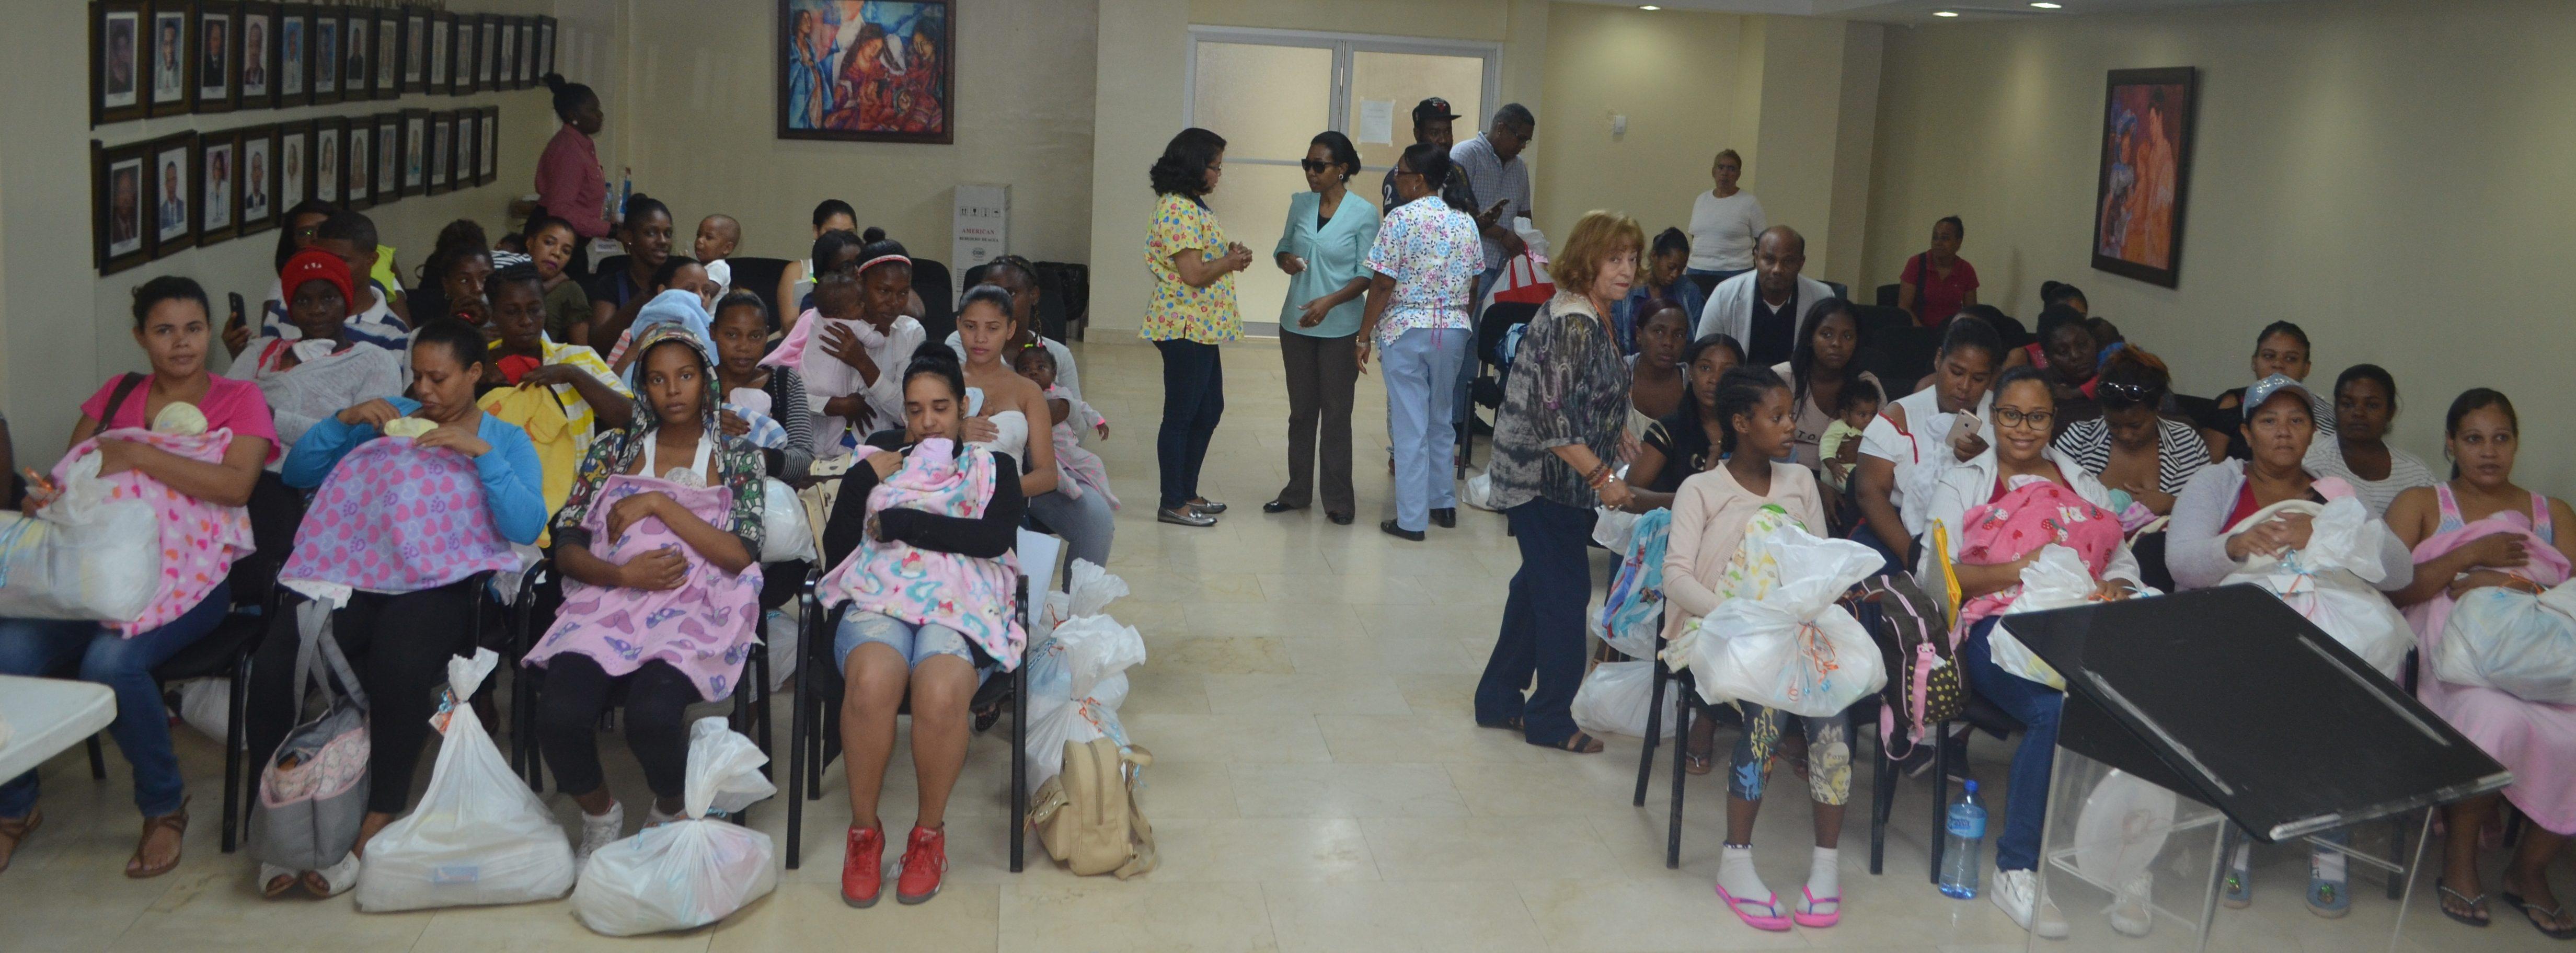 2da jornada Sonrisa de Angel Hospital Materno Infantil San Lorenzo de Los Mina